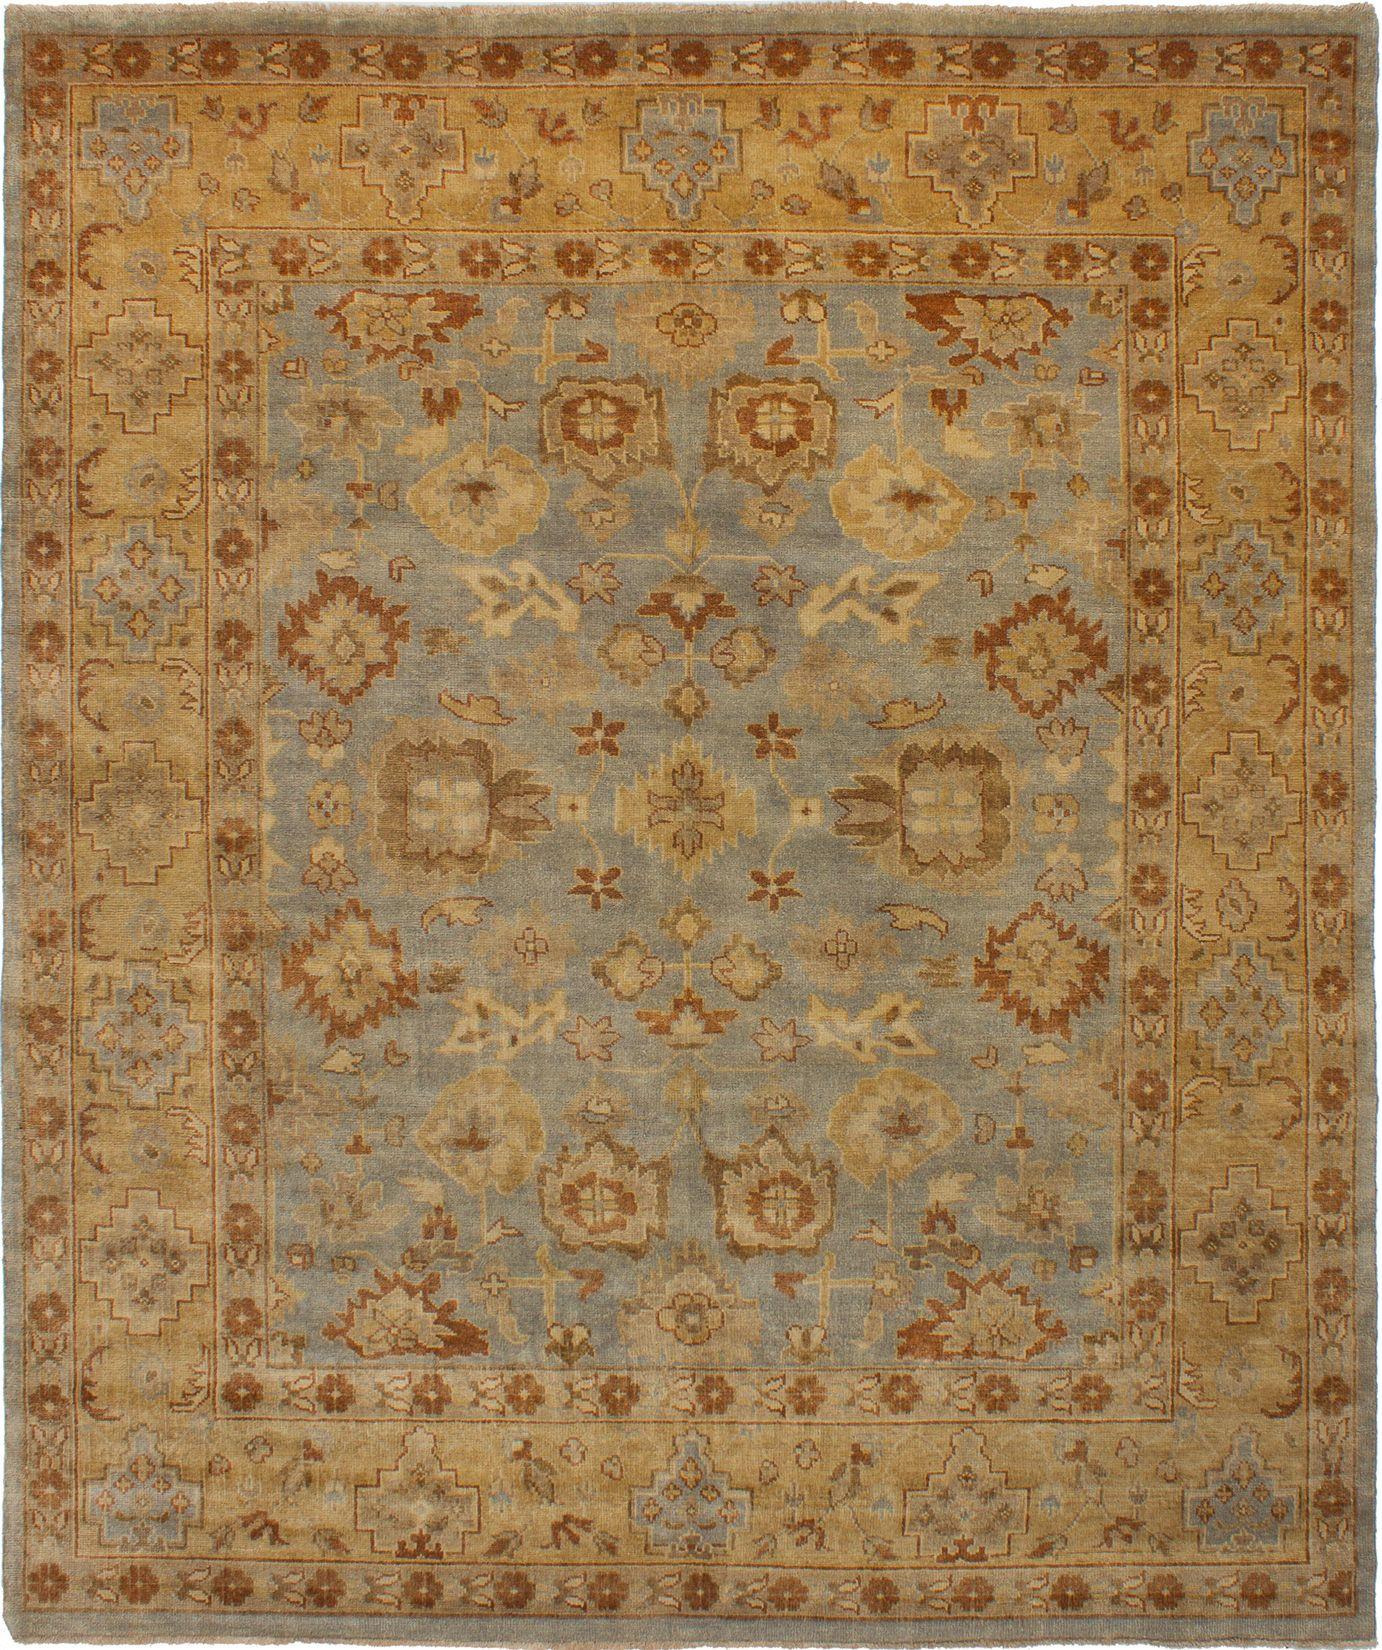 "Hand-knotted Royal Ushak Light Blue  Wool Rug 8'3"" x 9'10""  Size: 8'3"" x 9'10"""